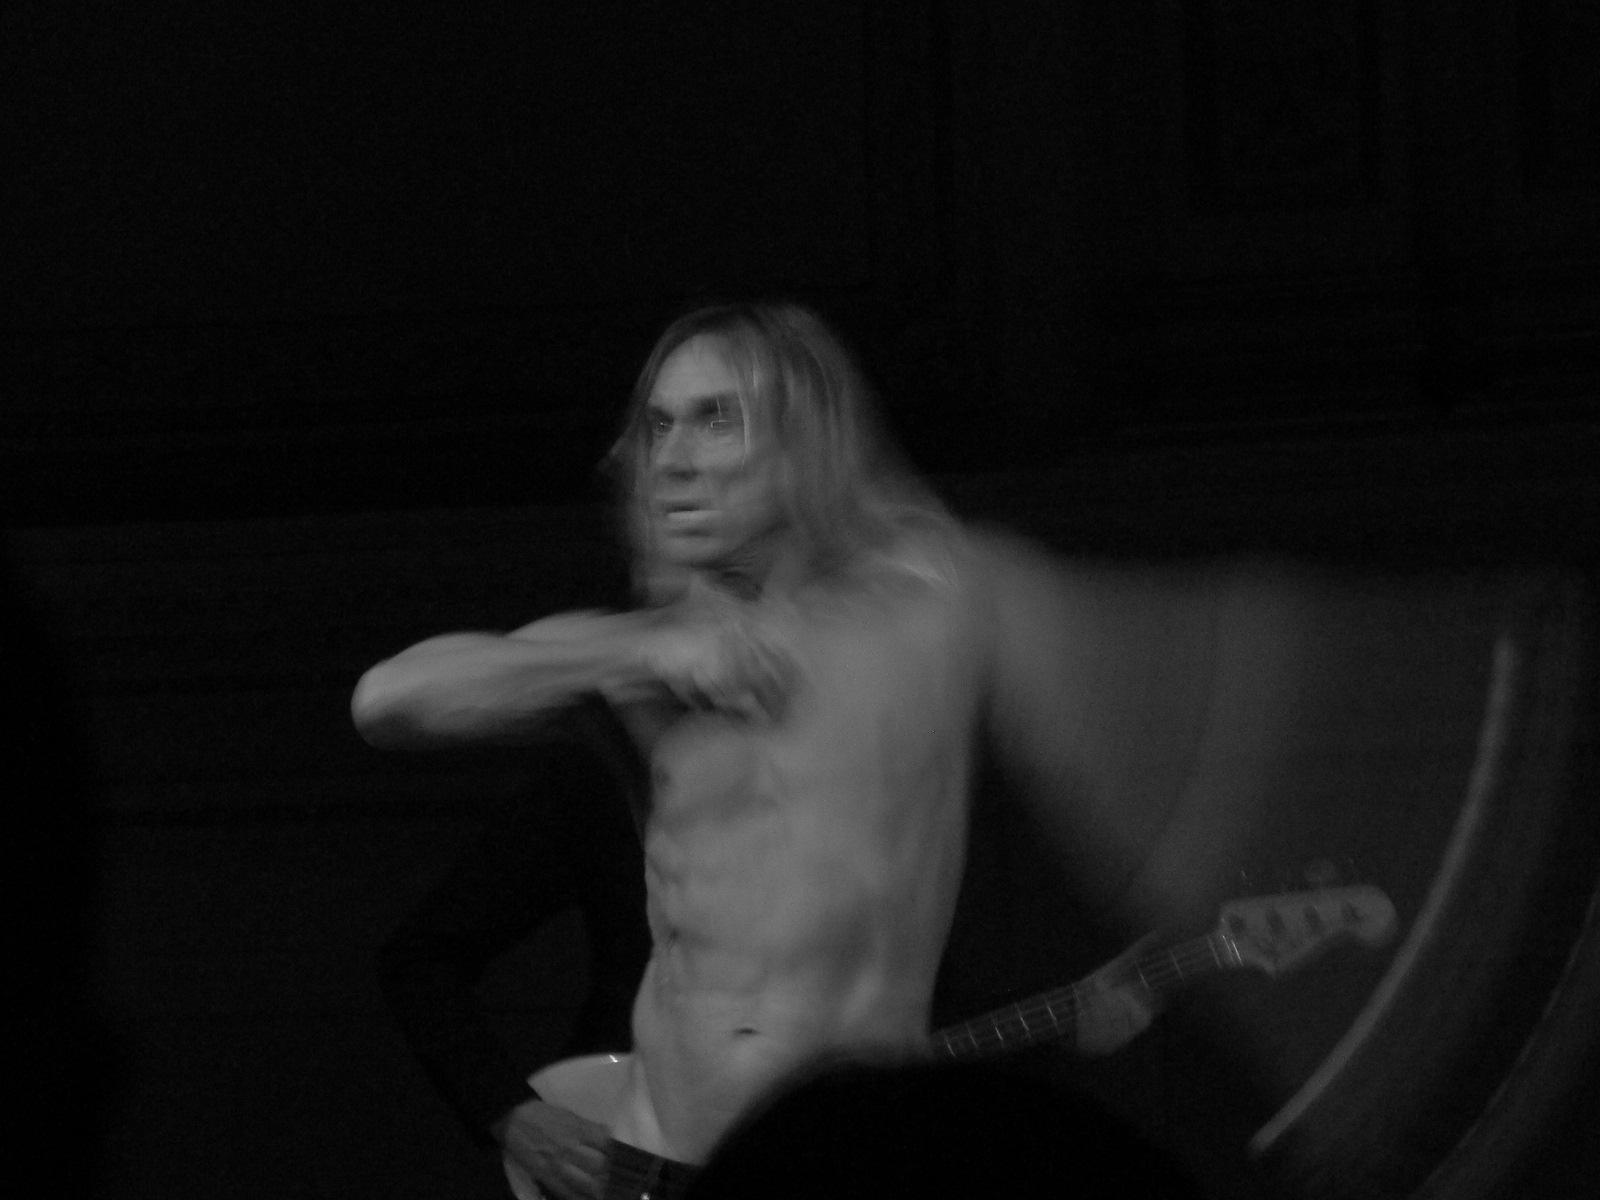 iggy pop, 2008